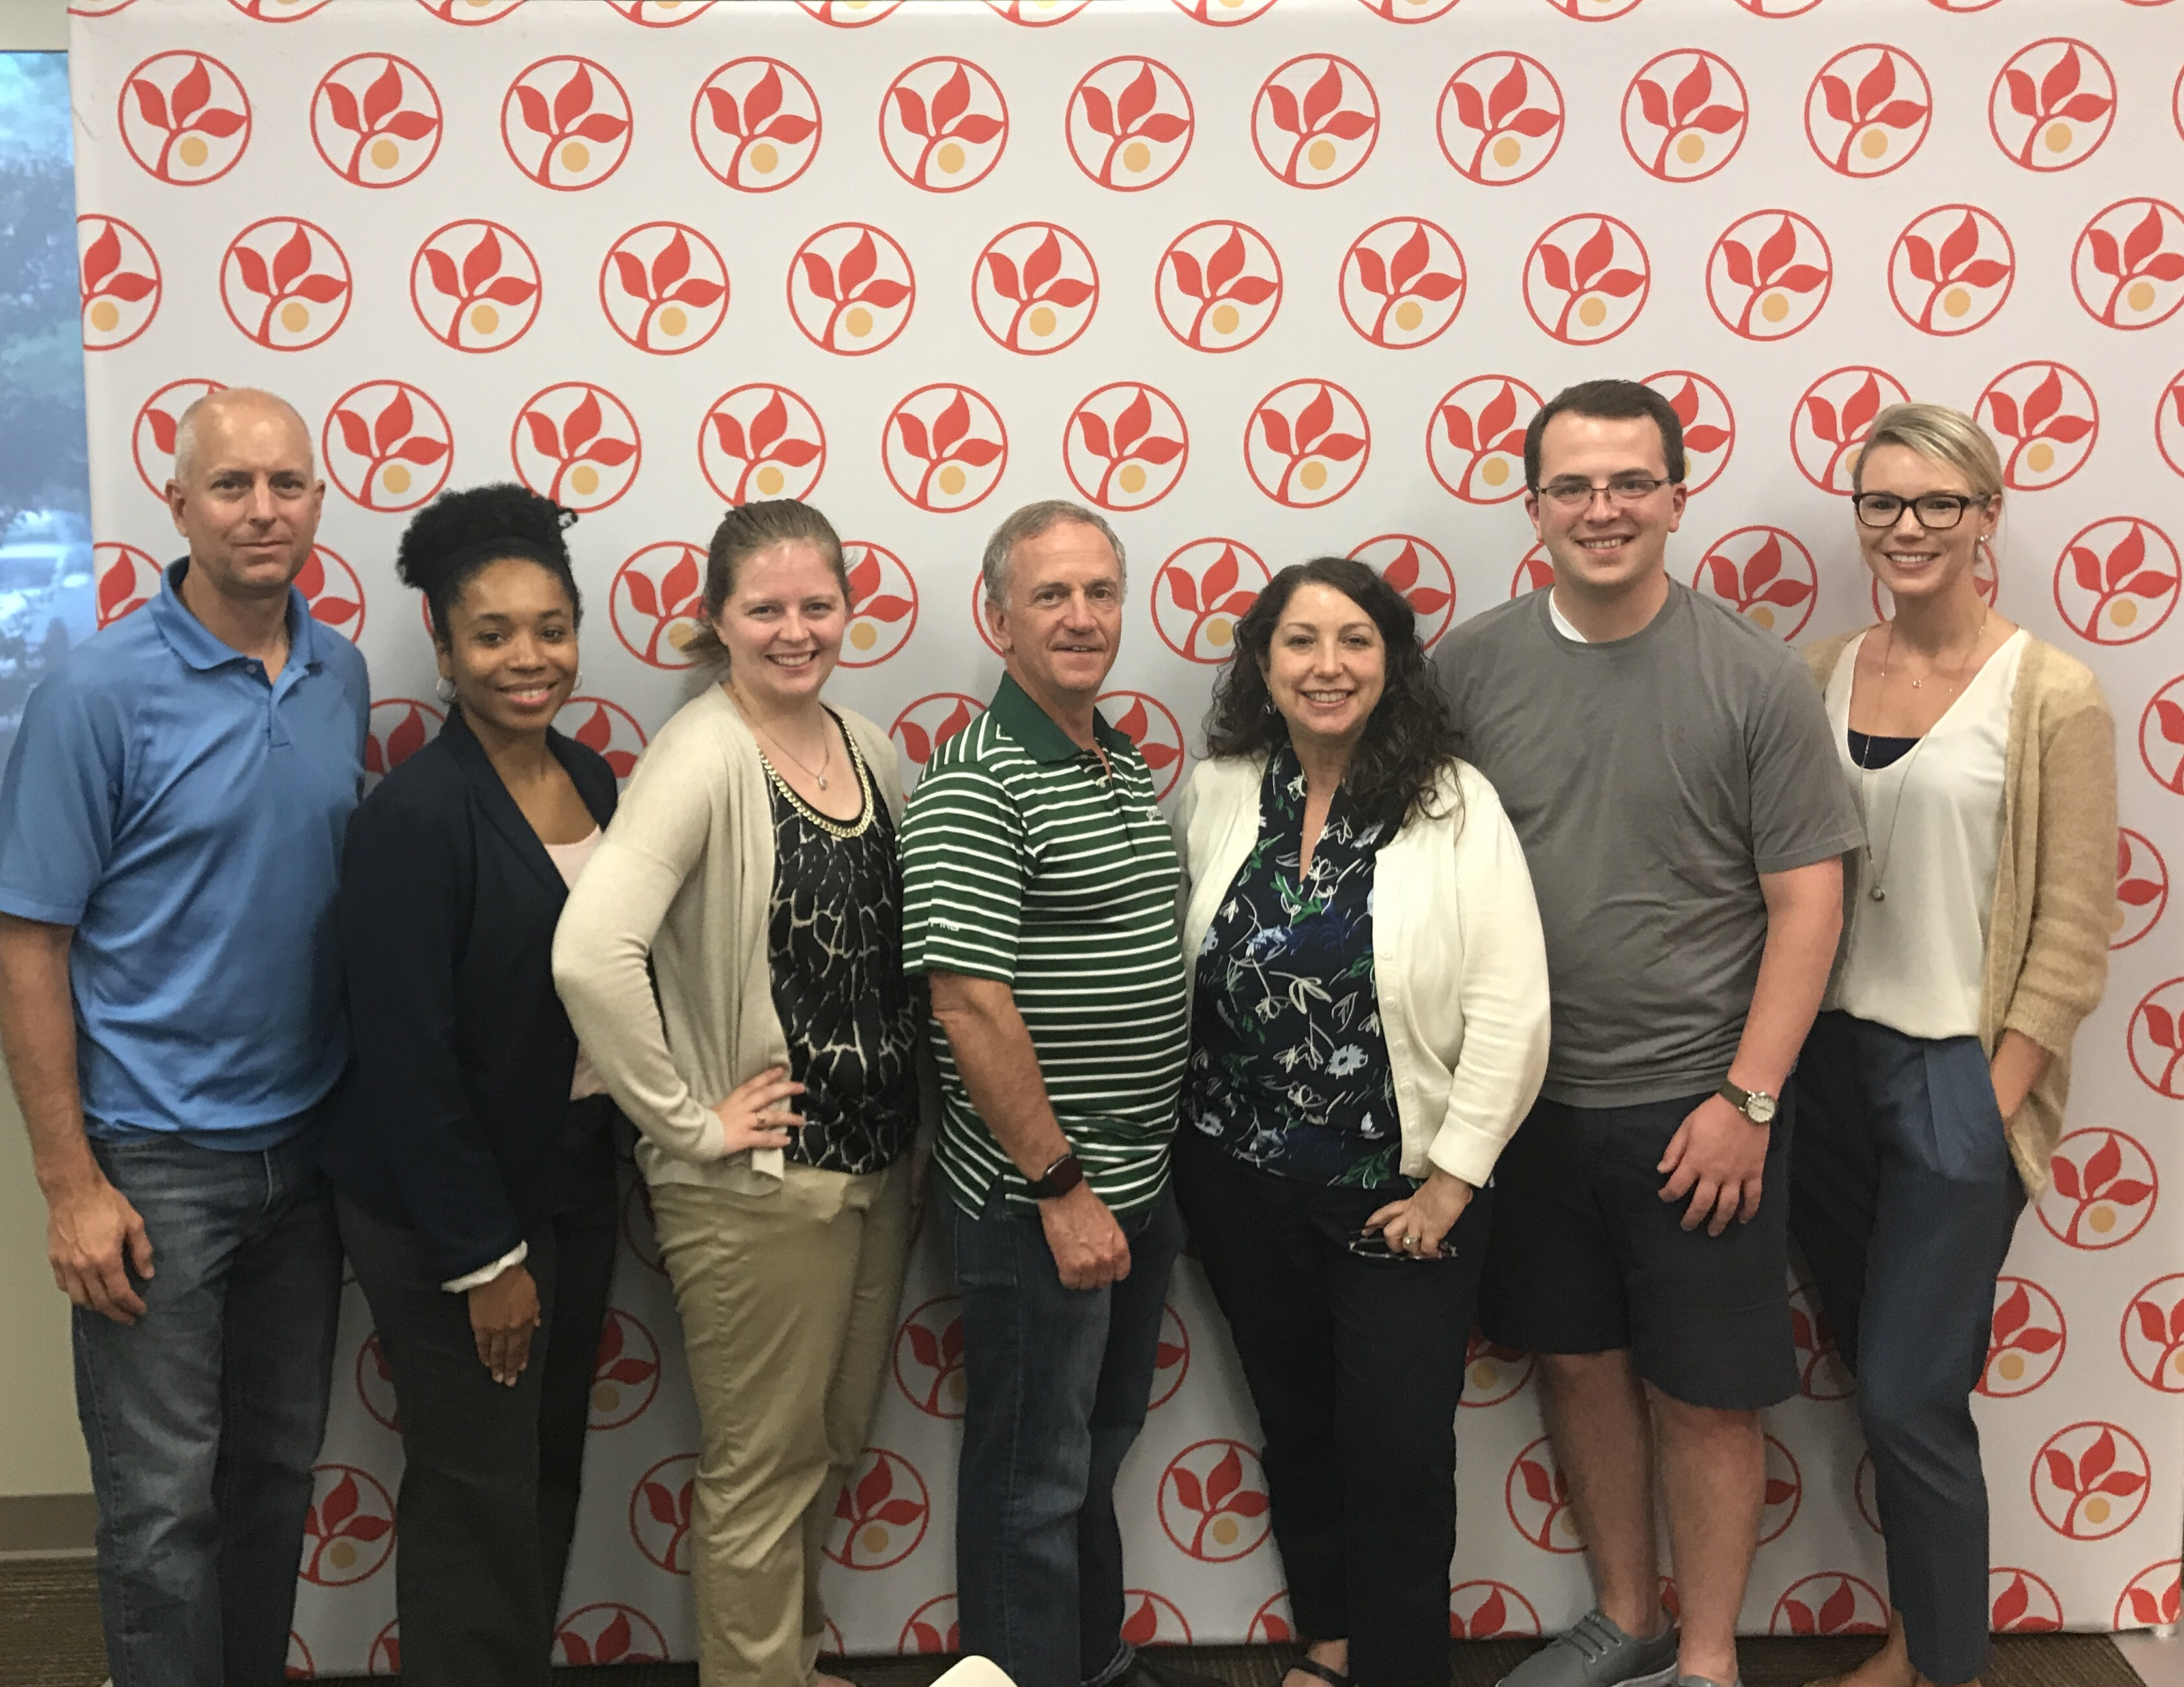 Maryland Food Bank - 12 July 2017